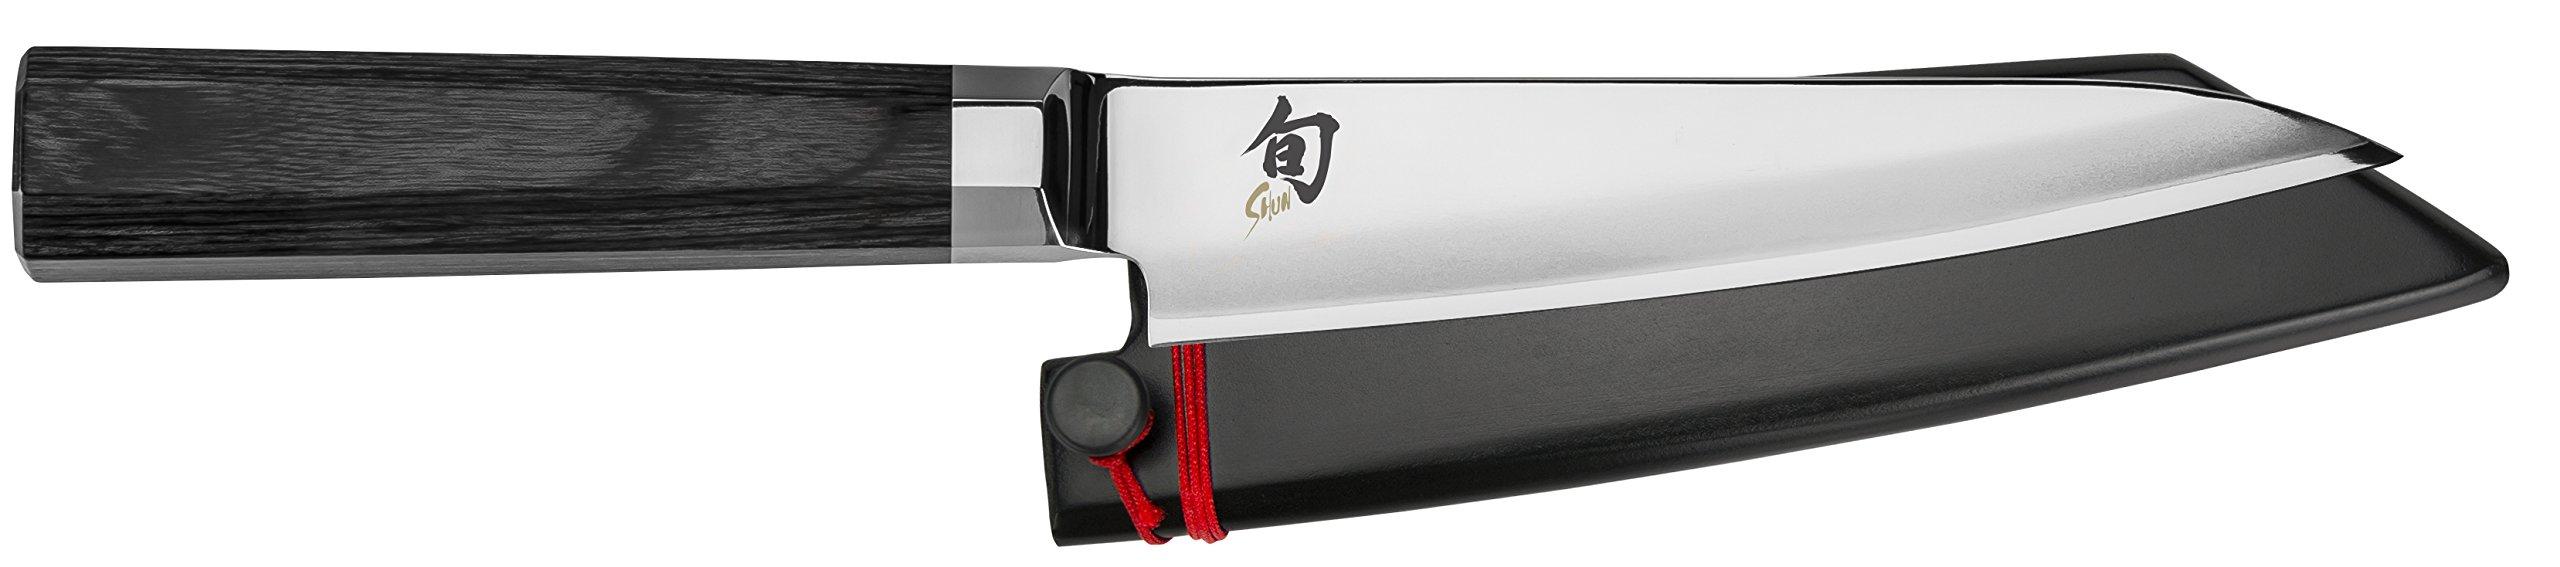 Shun VG0016 Petty Knife, 5.5'', Silver